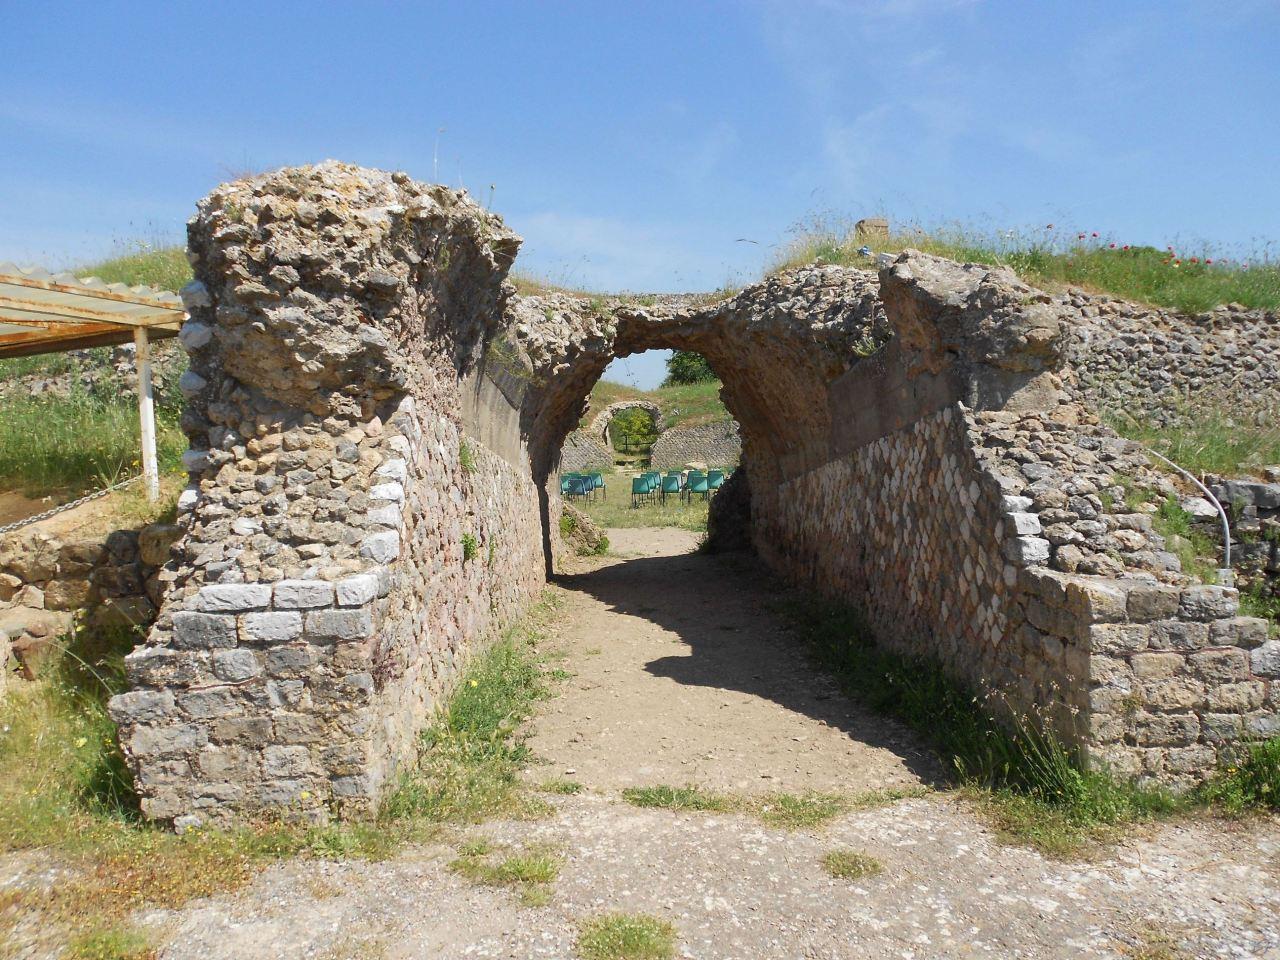 Roselle-Mura-Megalitiche-Roselle-Grosseto-Toscana-Italia-18